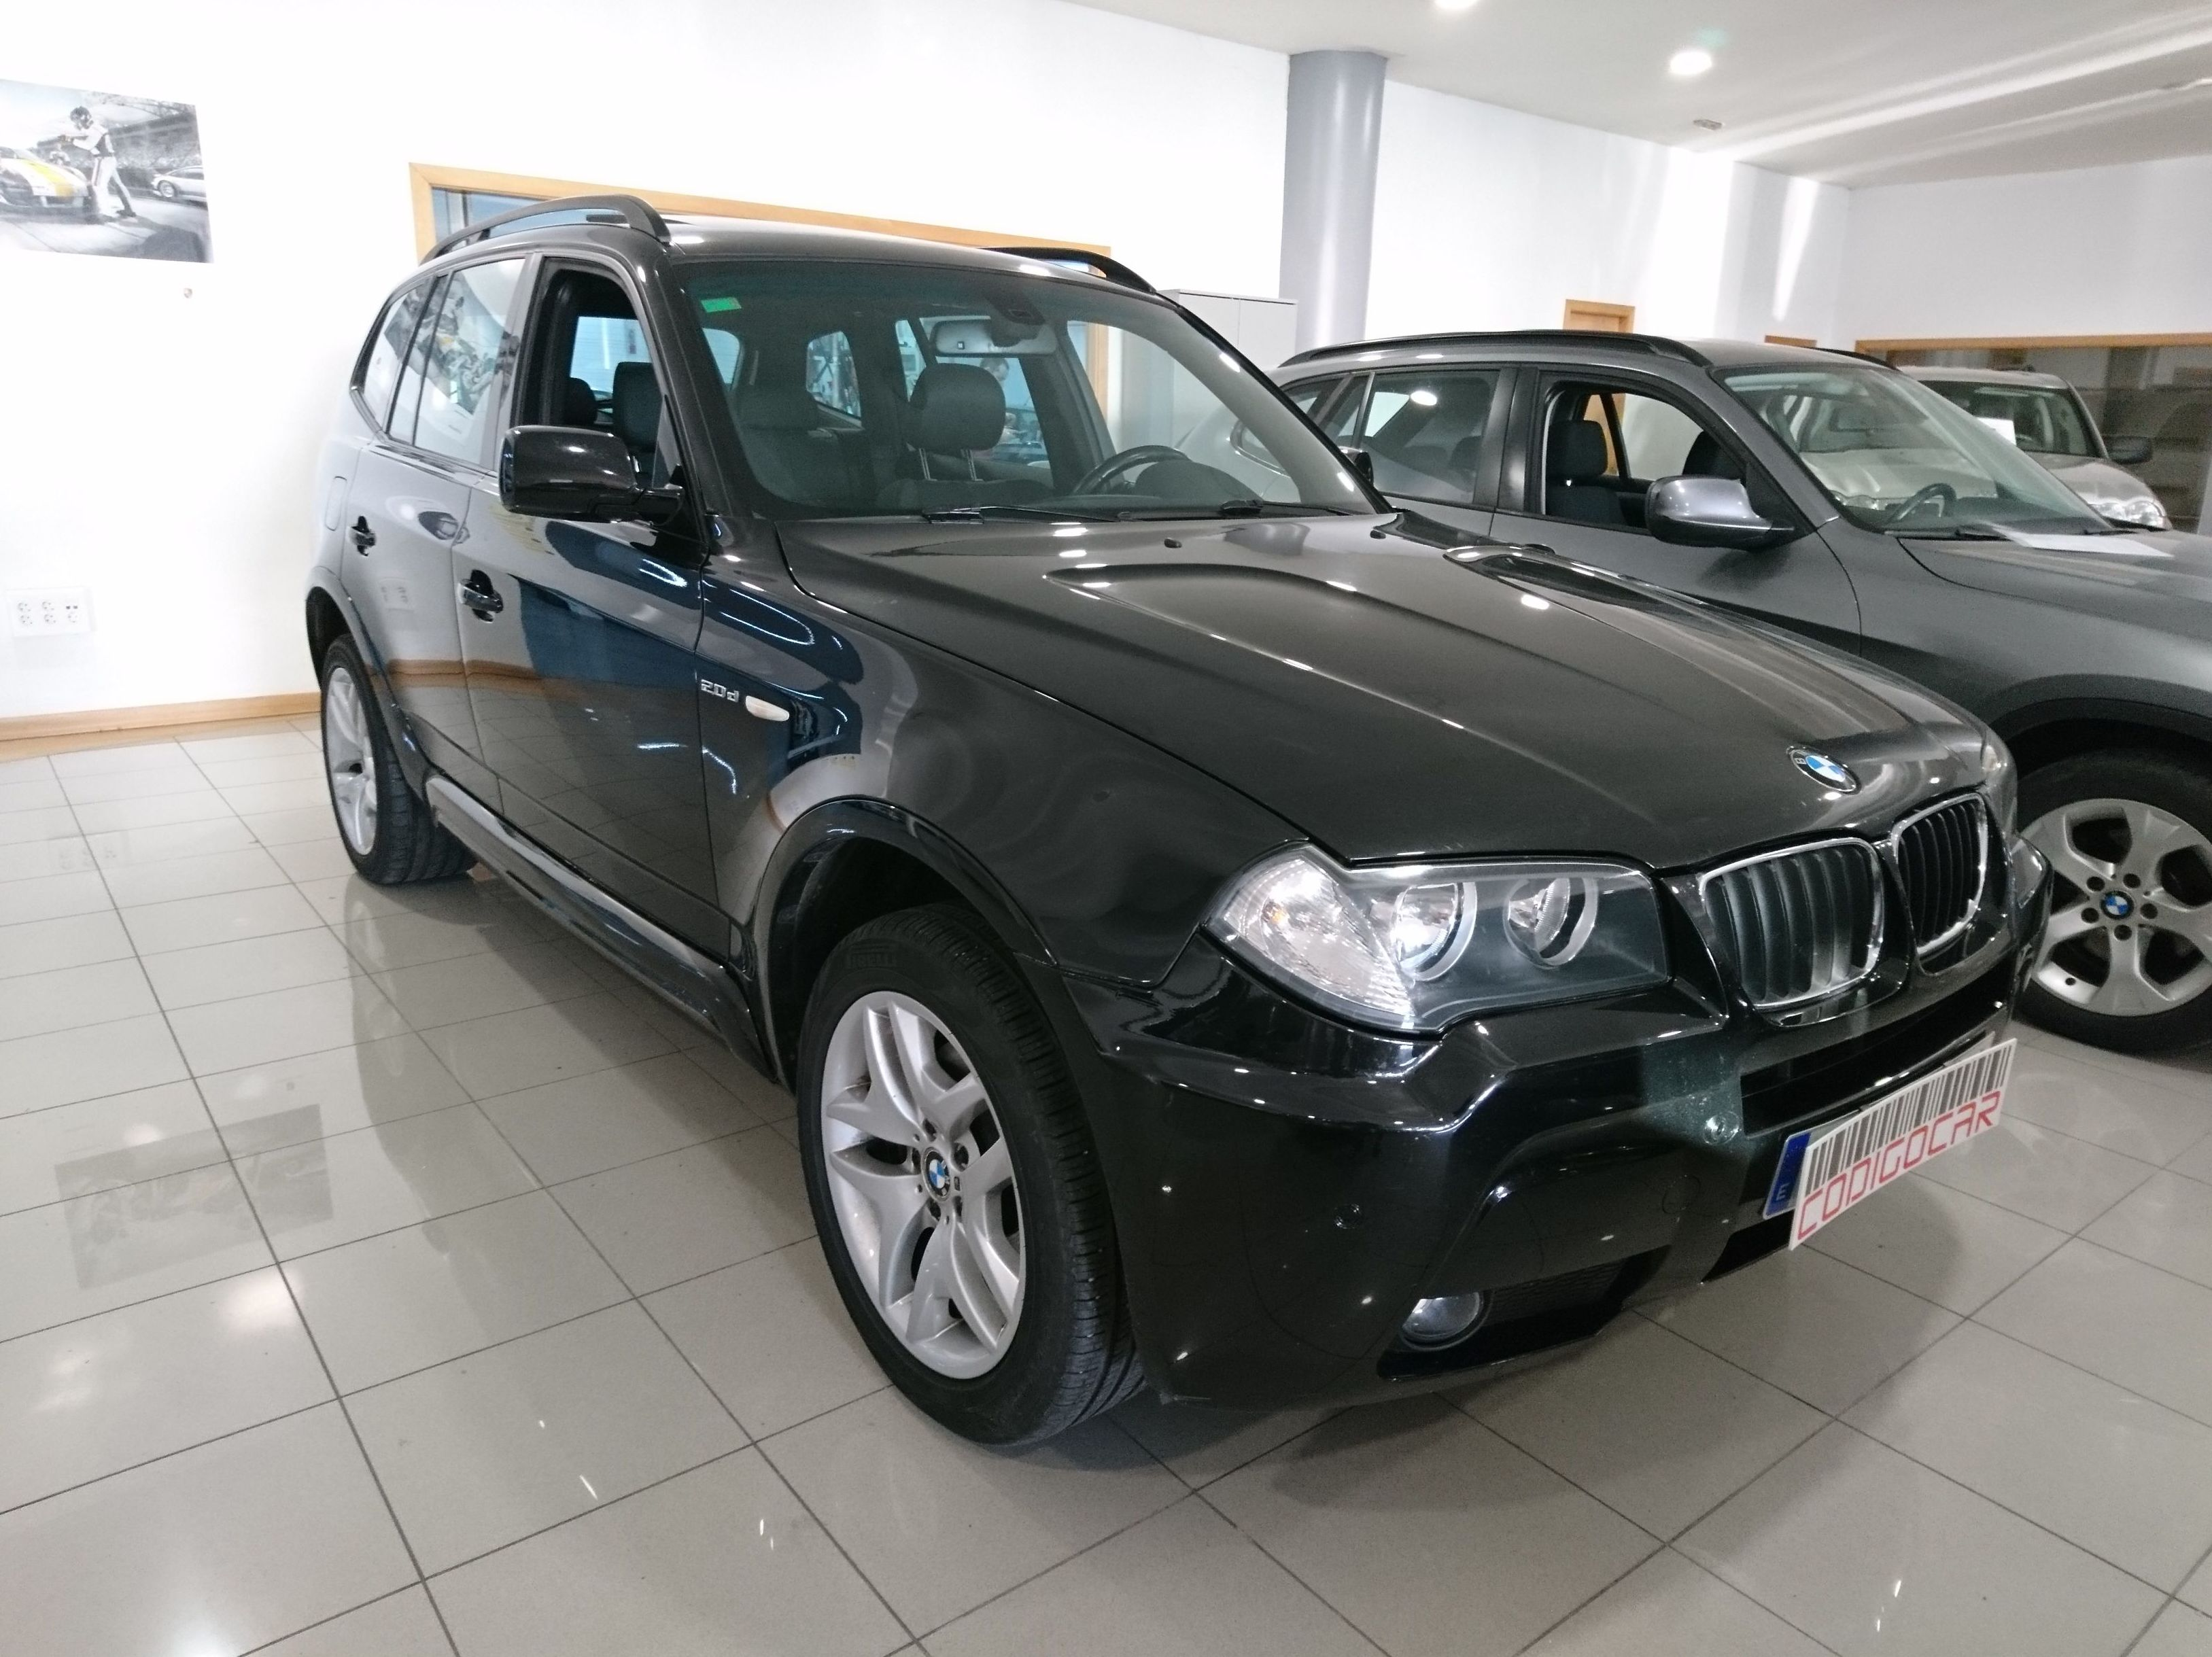 BMW X3 2.0D M TECHO PANORAMICO: Compra venta de coches de CODIGOCAR